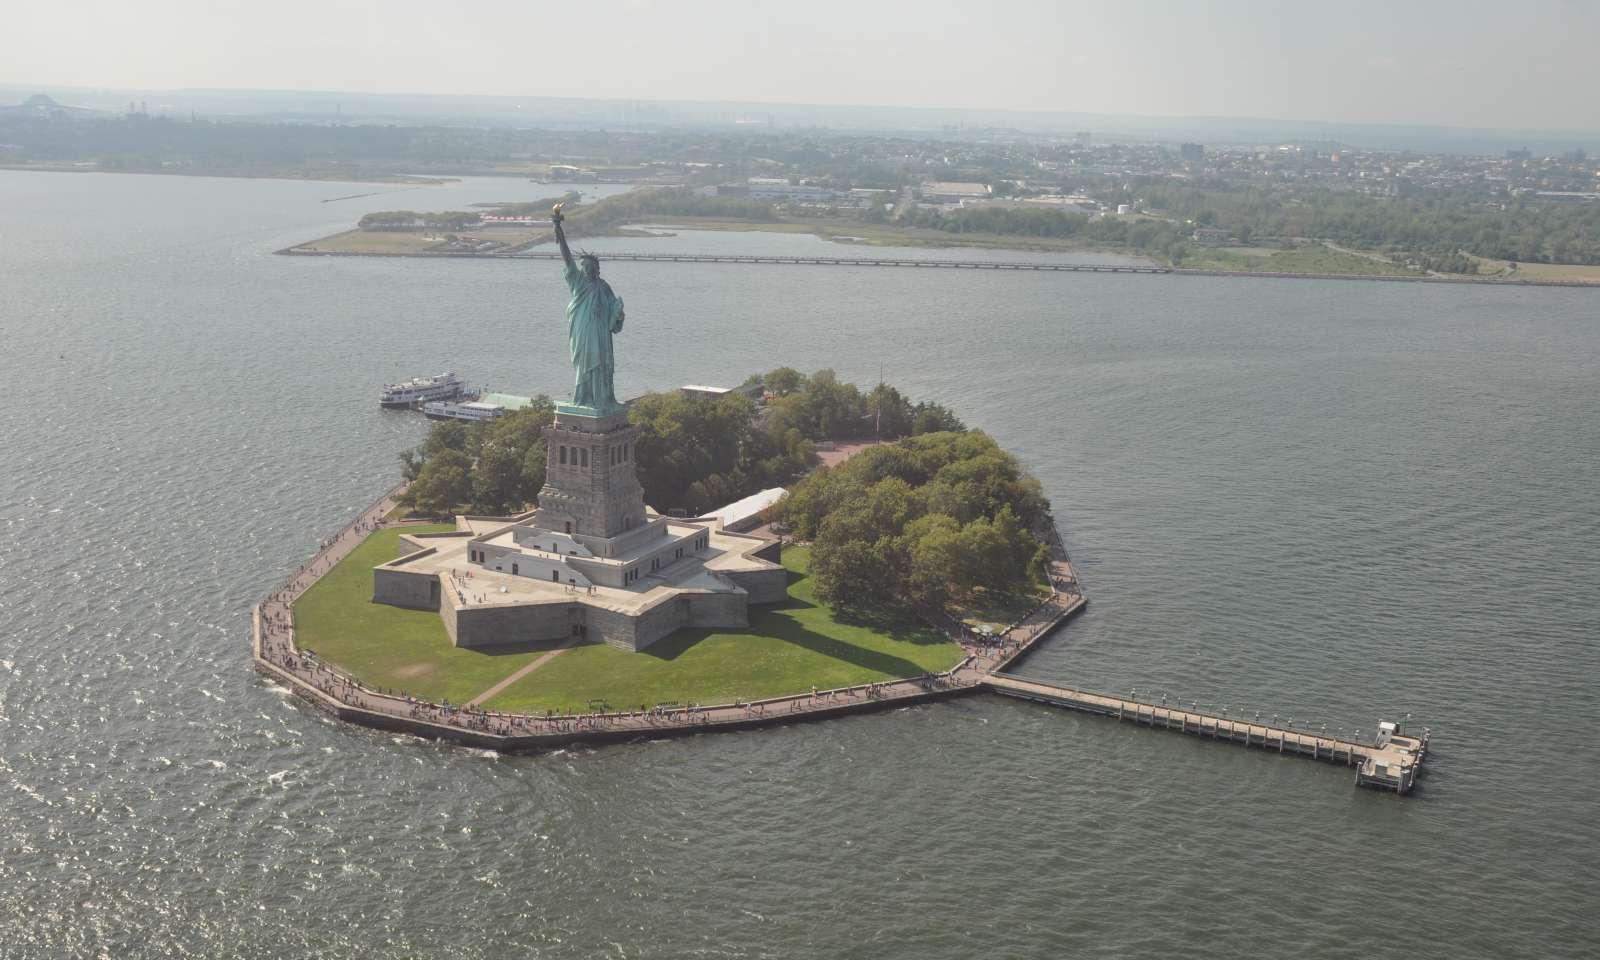 Tour en helicóptero en Nueva York: Estatua de la Libertad